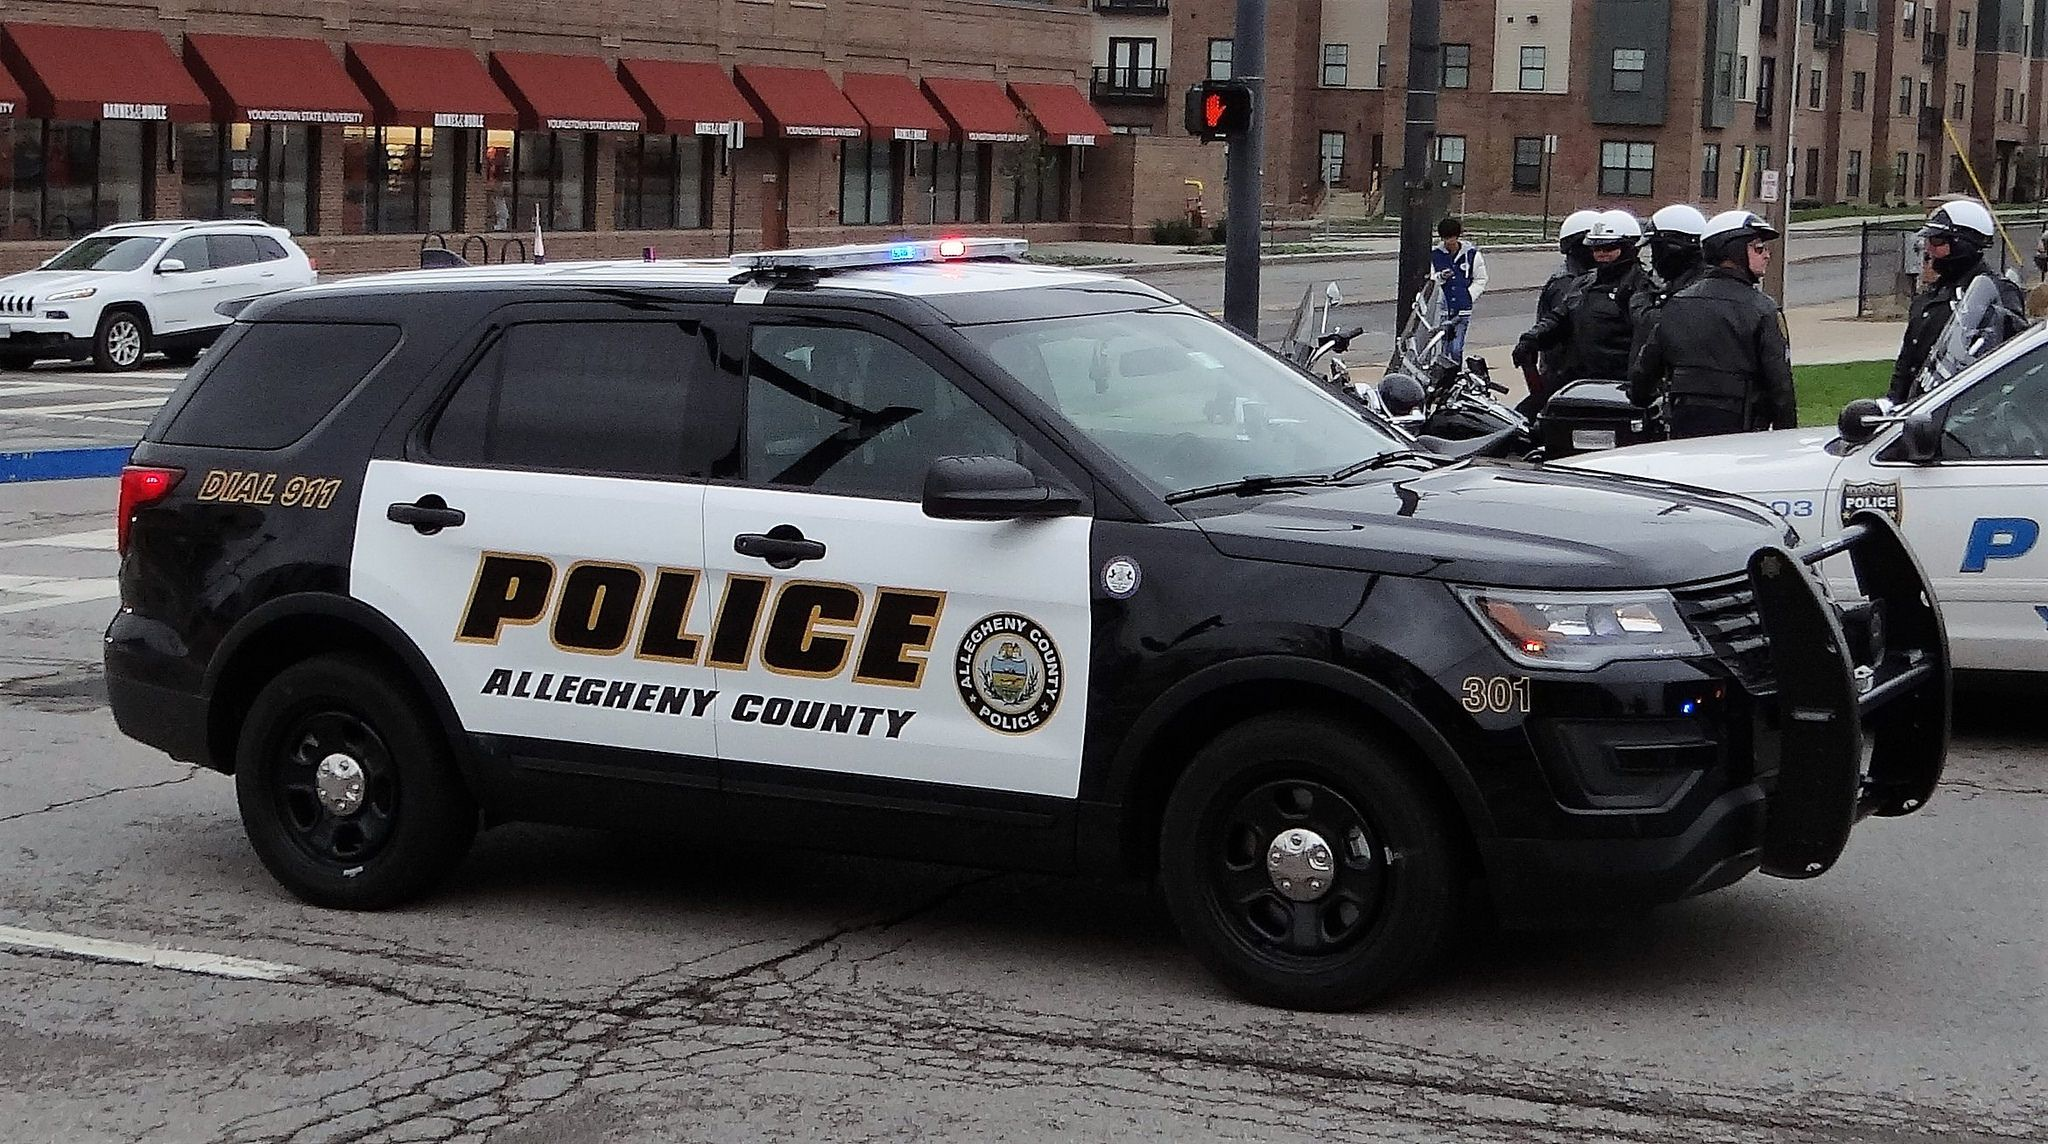 Used Police Cars For Sale In Pa >> Allegheny Motors - impremedia.net